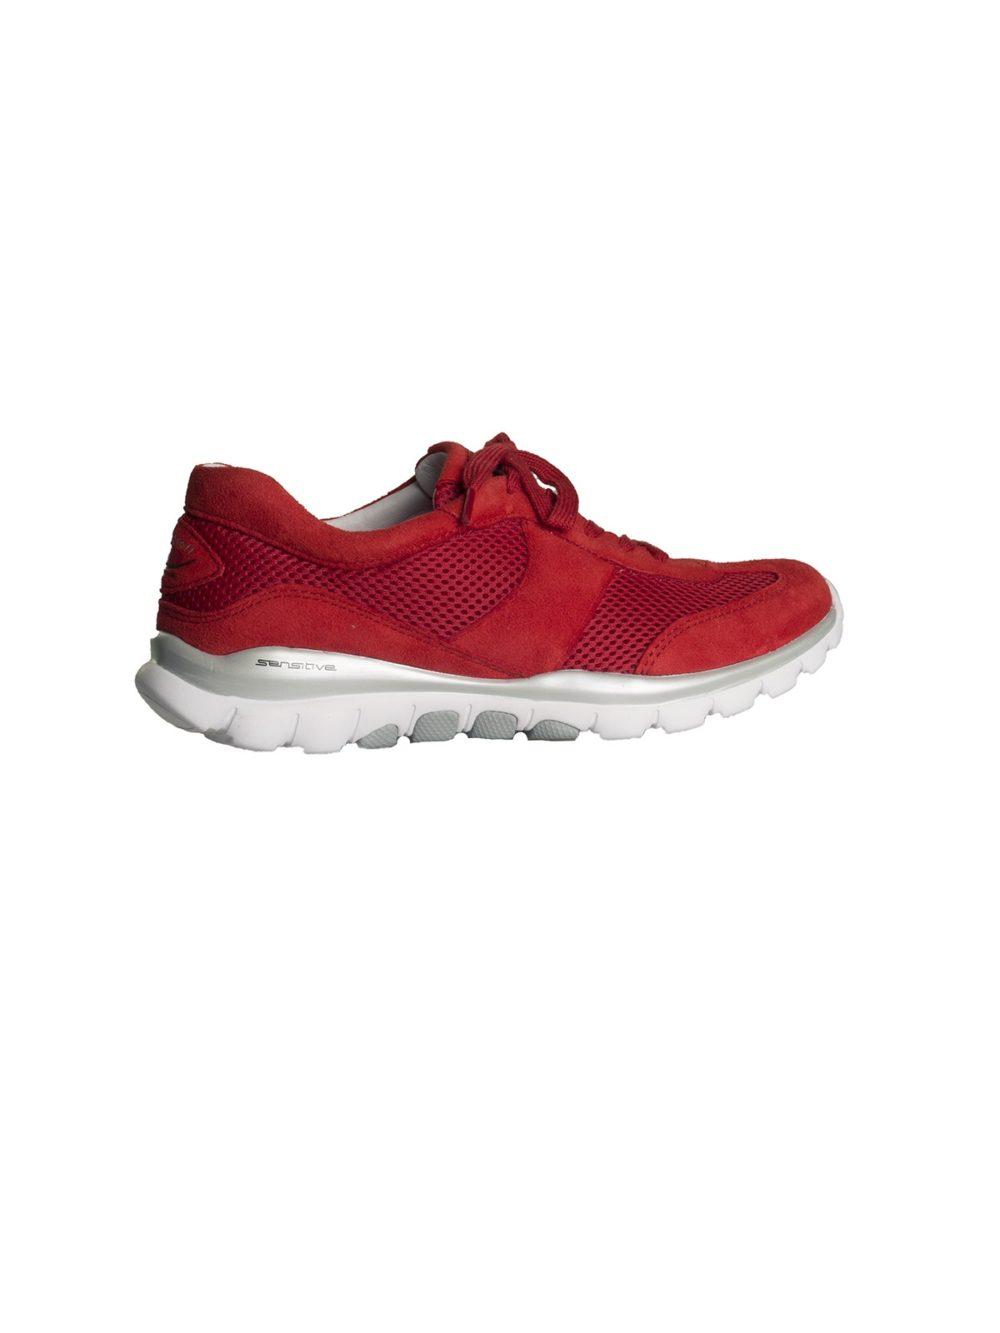 Helen Shoe Gabor Shoes Katie Kerr Women's Clothing